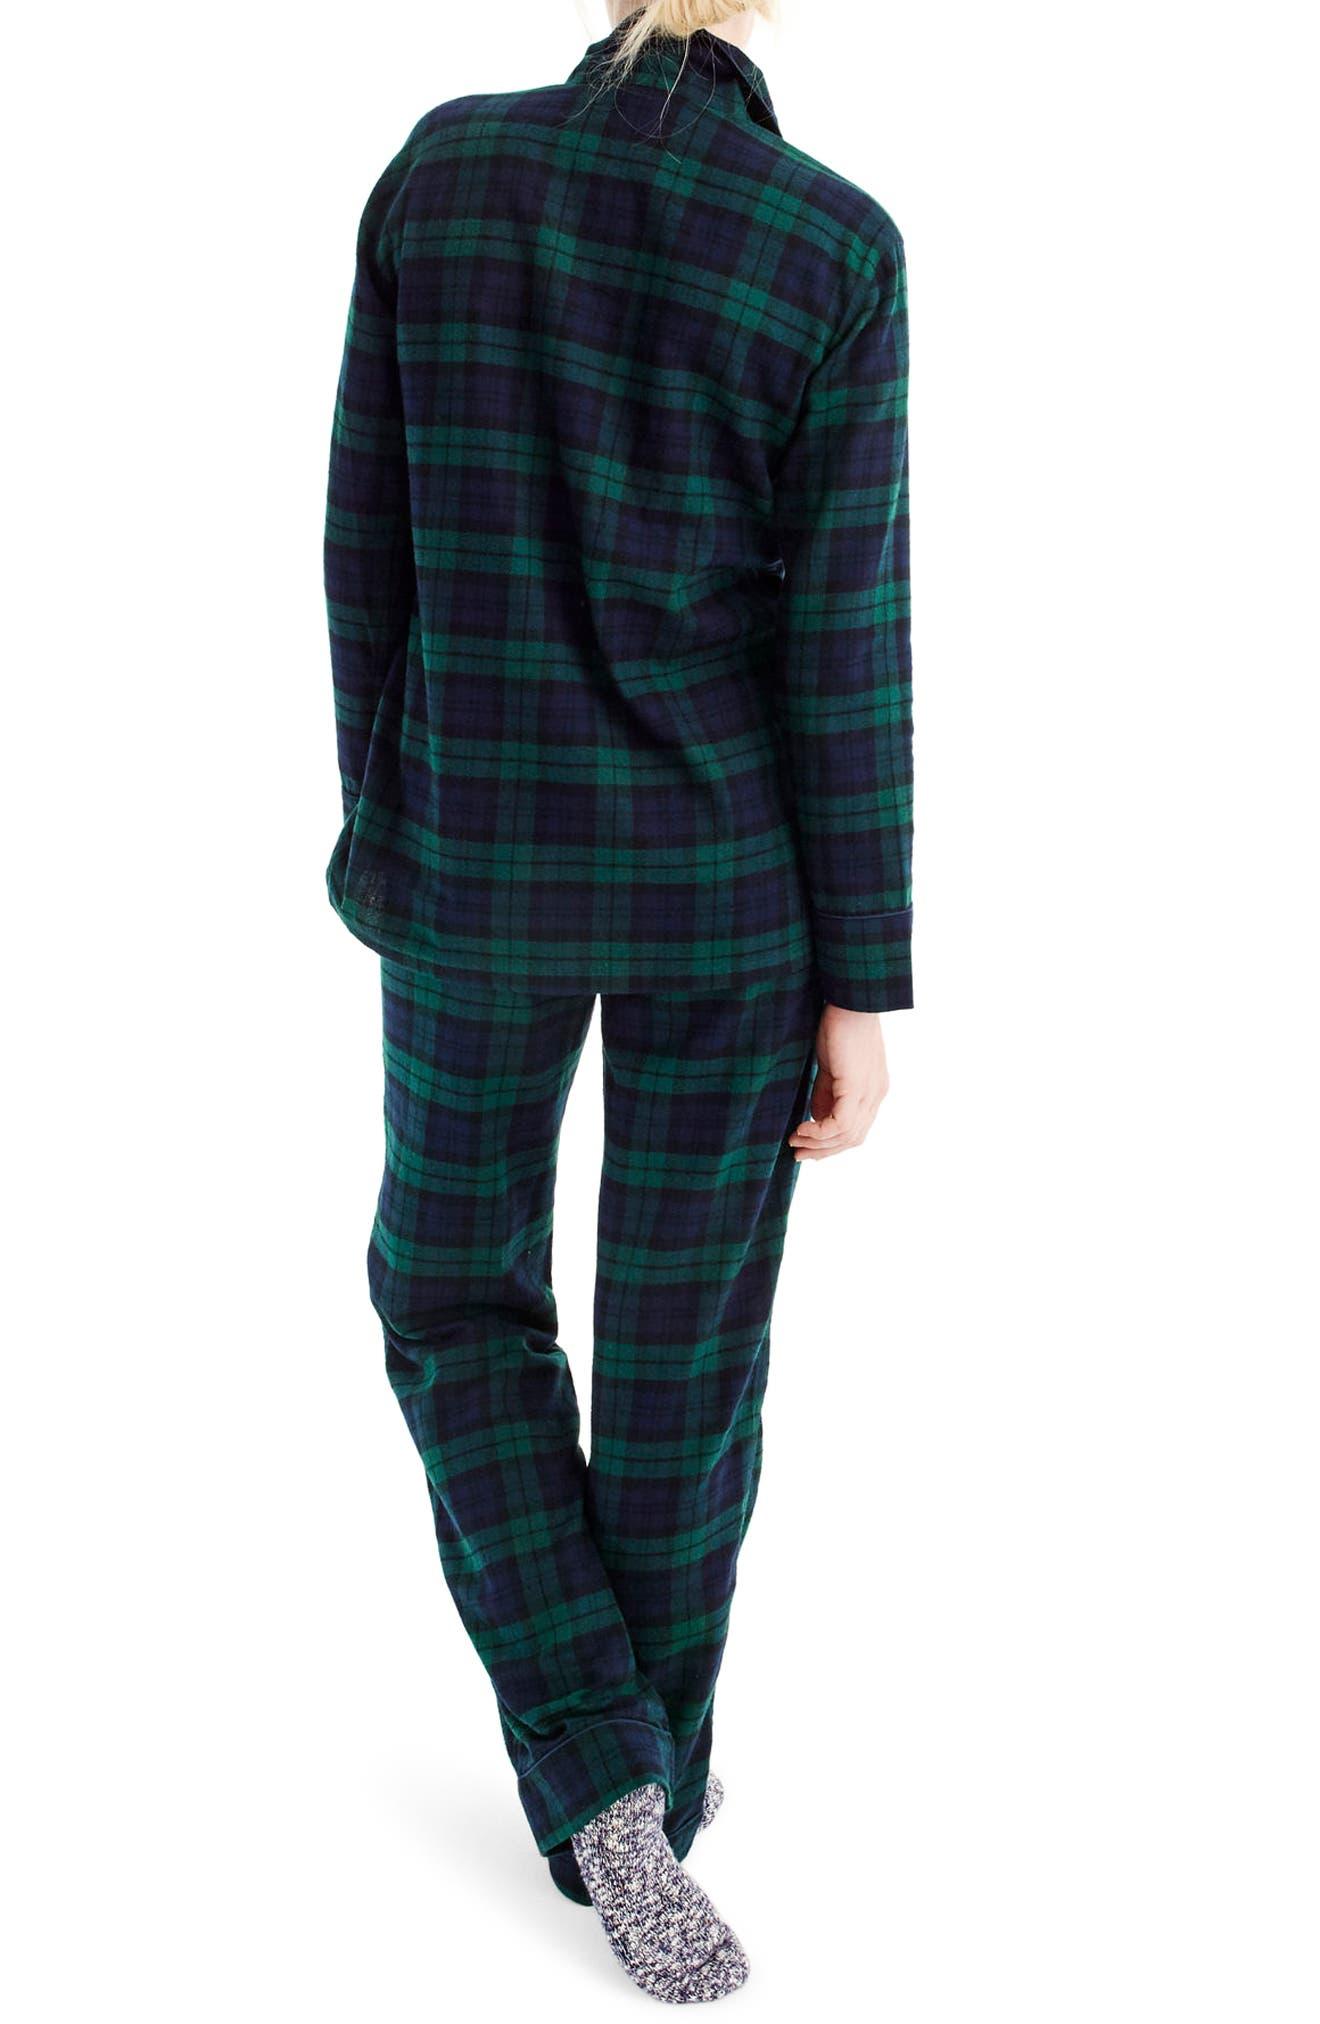 J.CREW,                             Blackwatch Flannel Pajamas,                             Alternate thumbnail 3, color,                             001